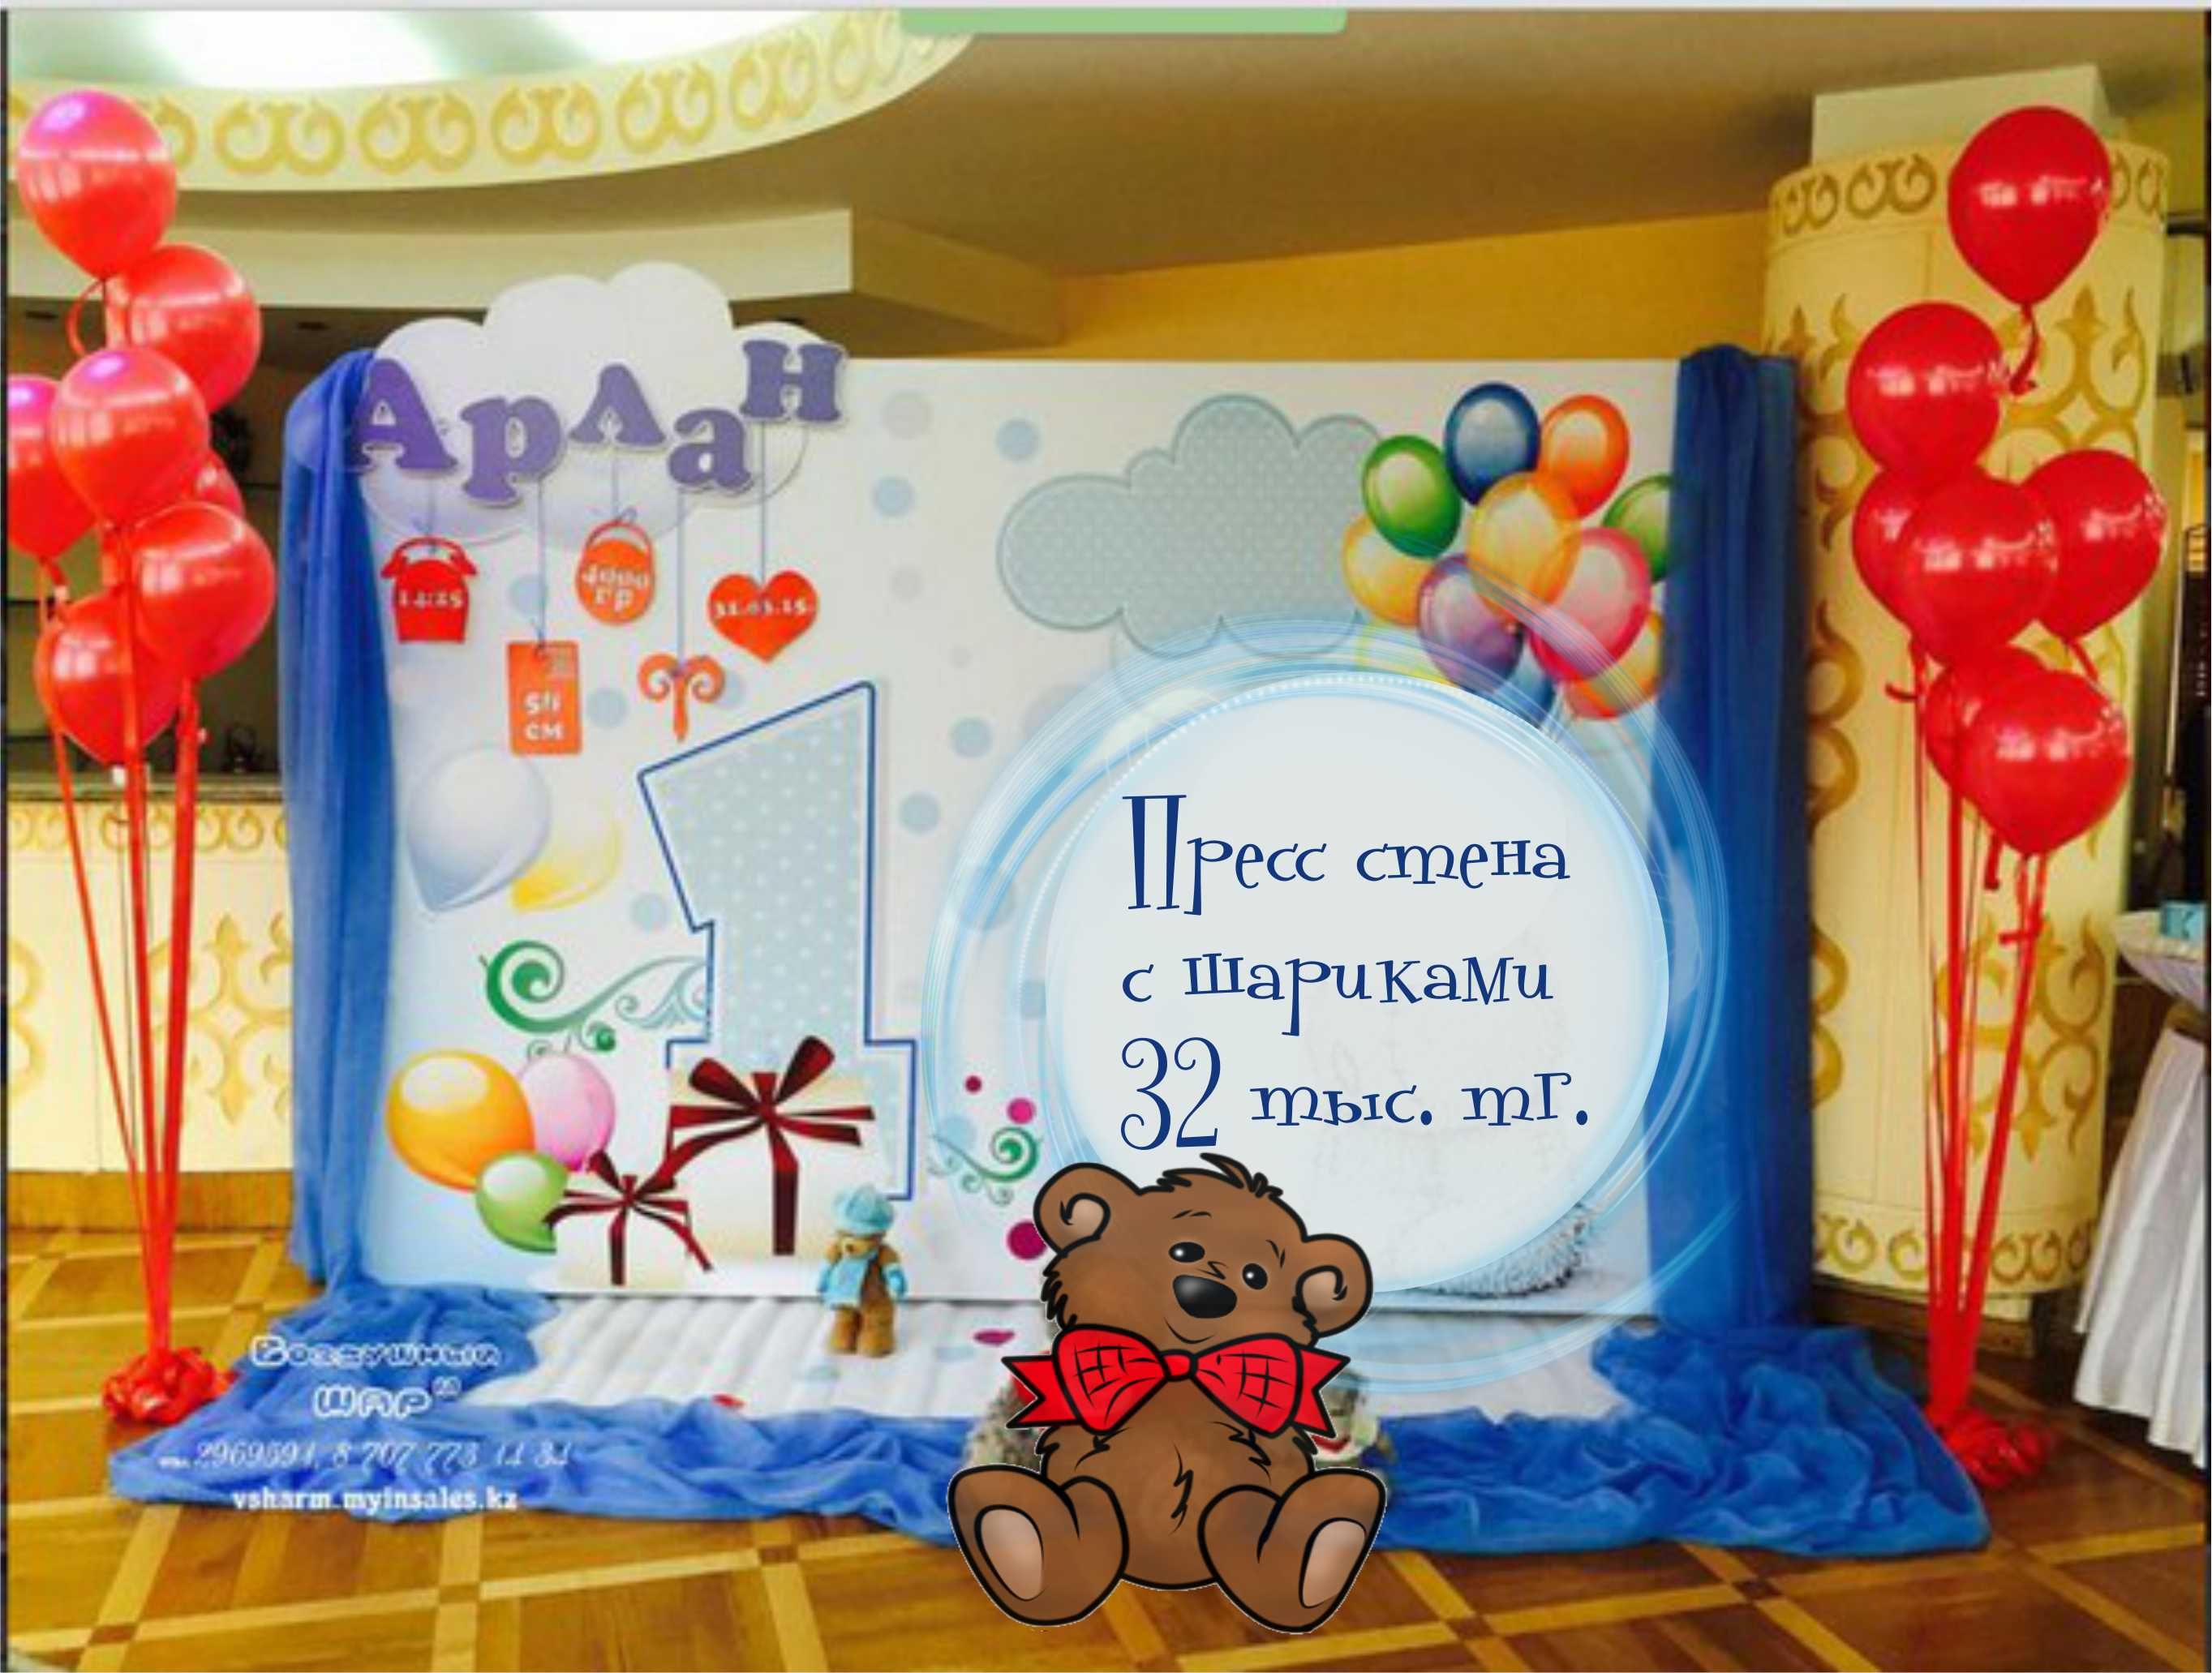 Пресс_стена_на_годик_Алматы_2018.jpg